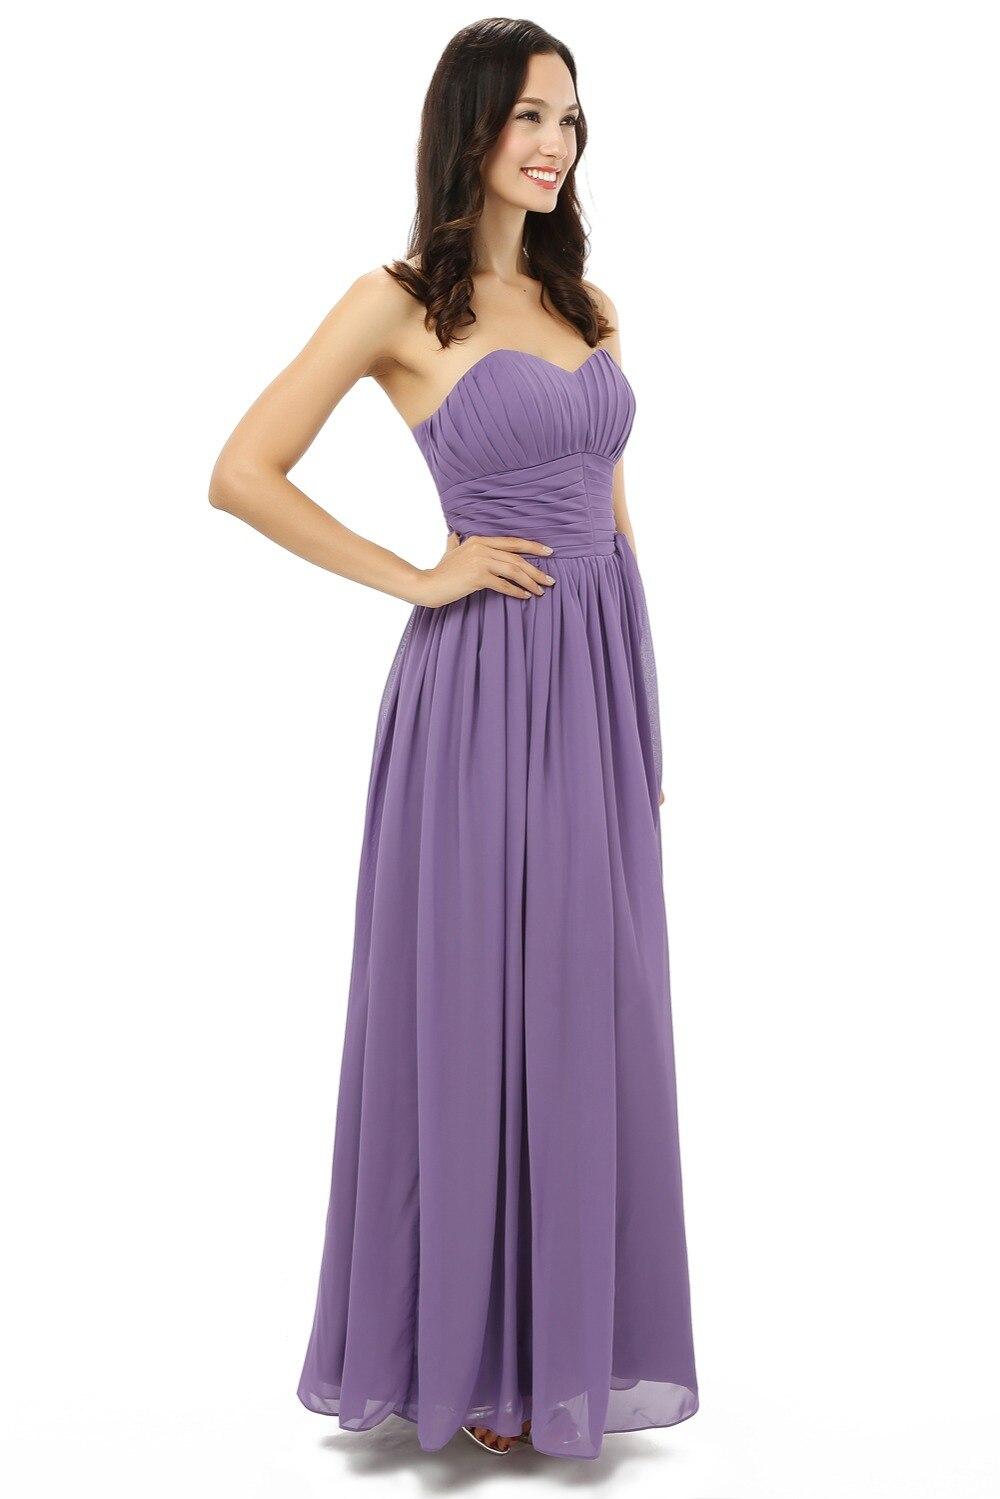 Increíble Comprar Vestido De Novia En Línea Usa Motivo - Vestido de ...